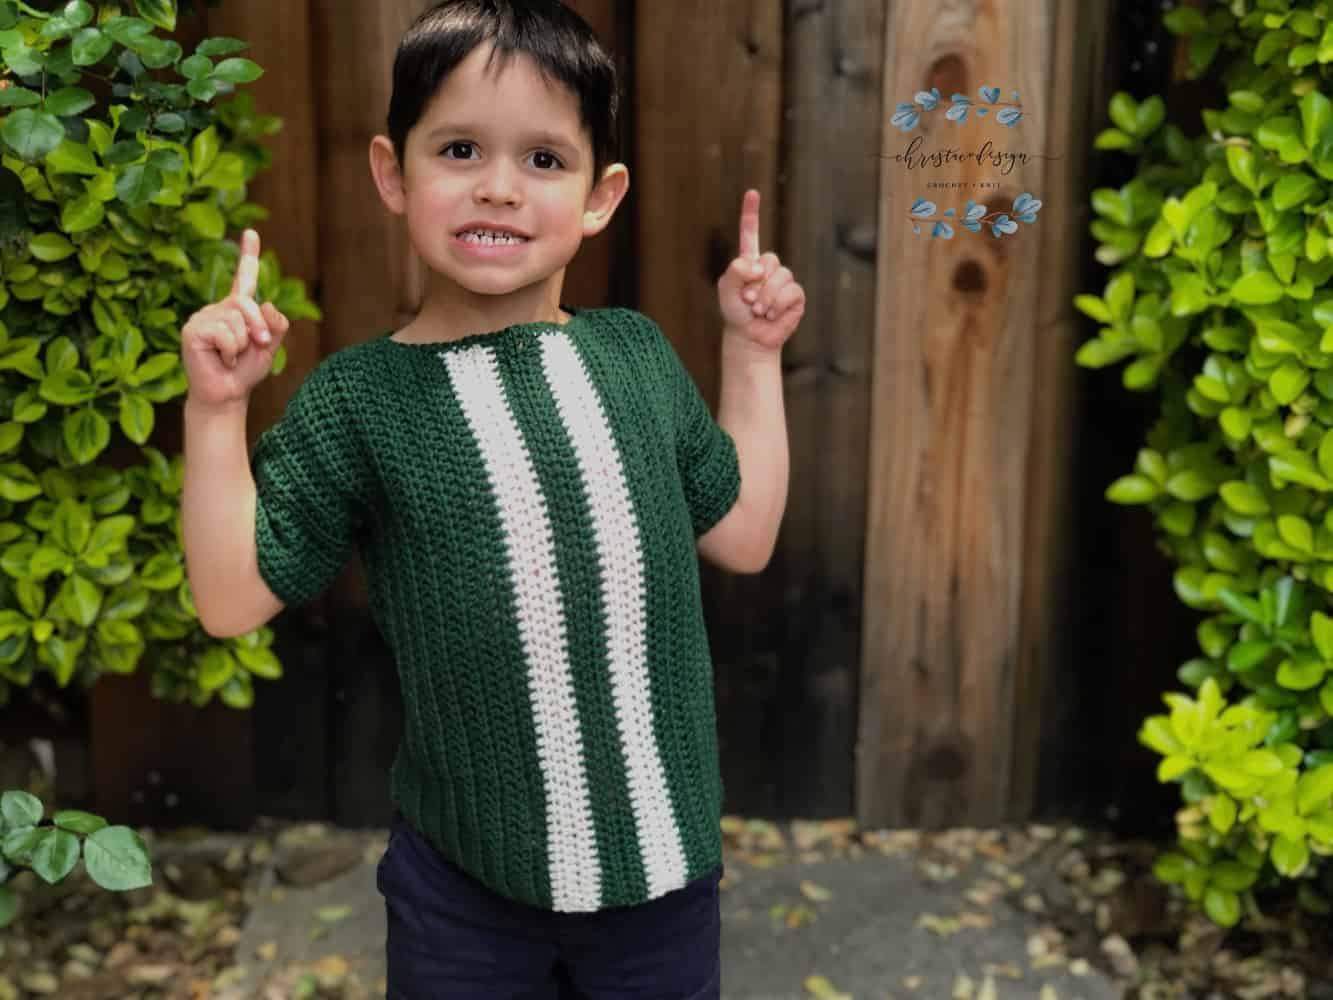 Crochet Kids Racing T-Shirt a Free Crochet Pattern